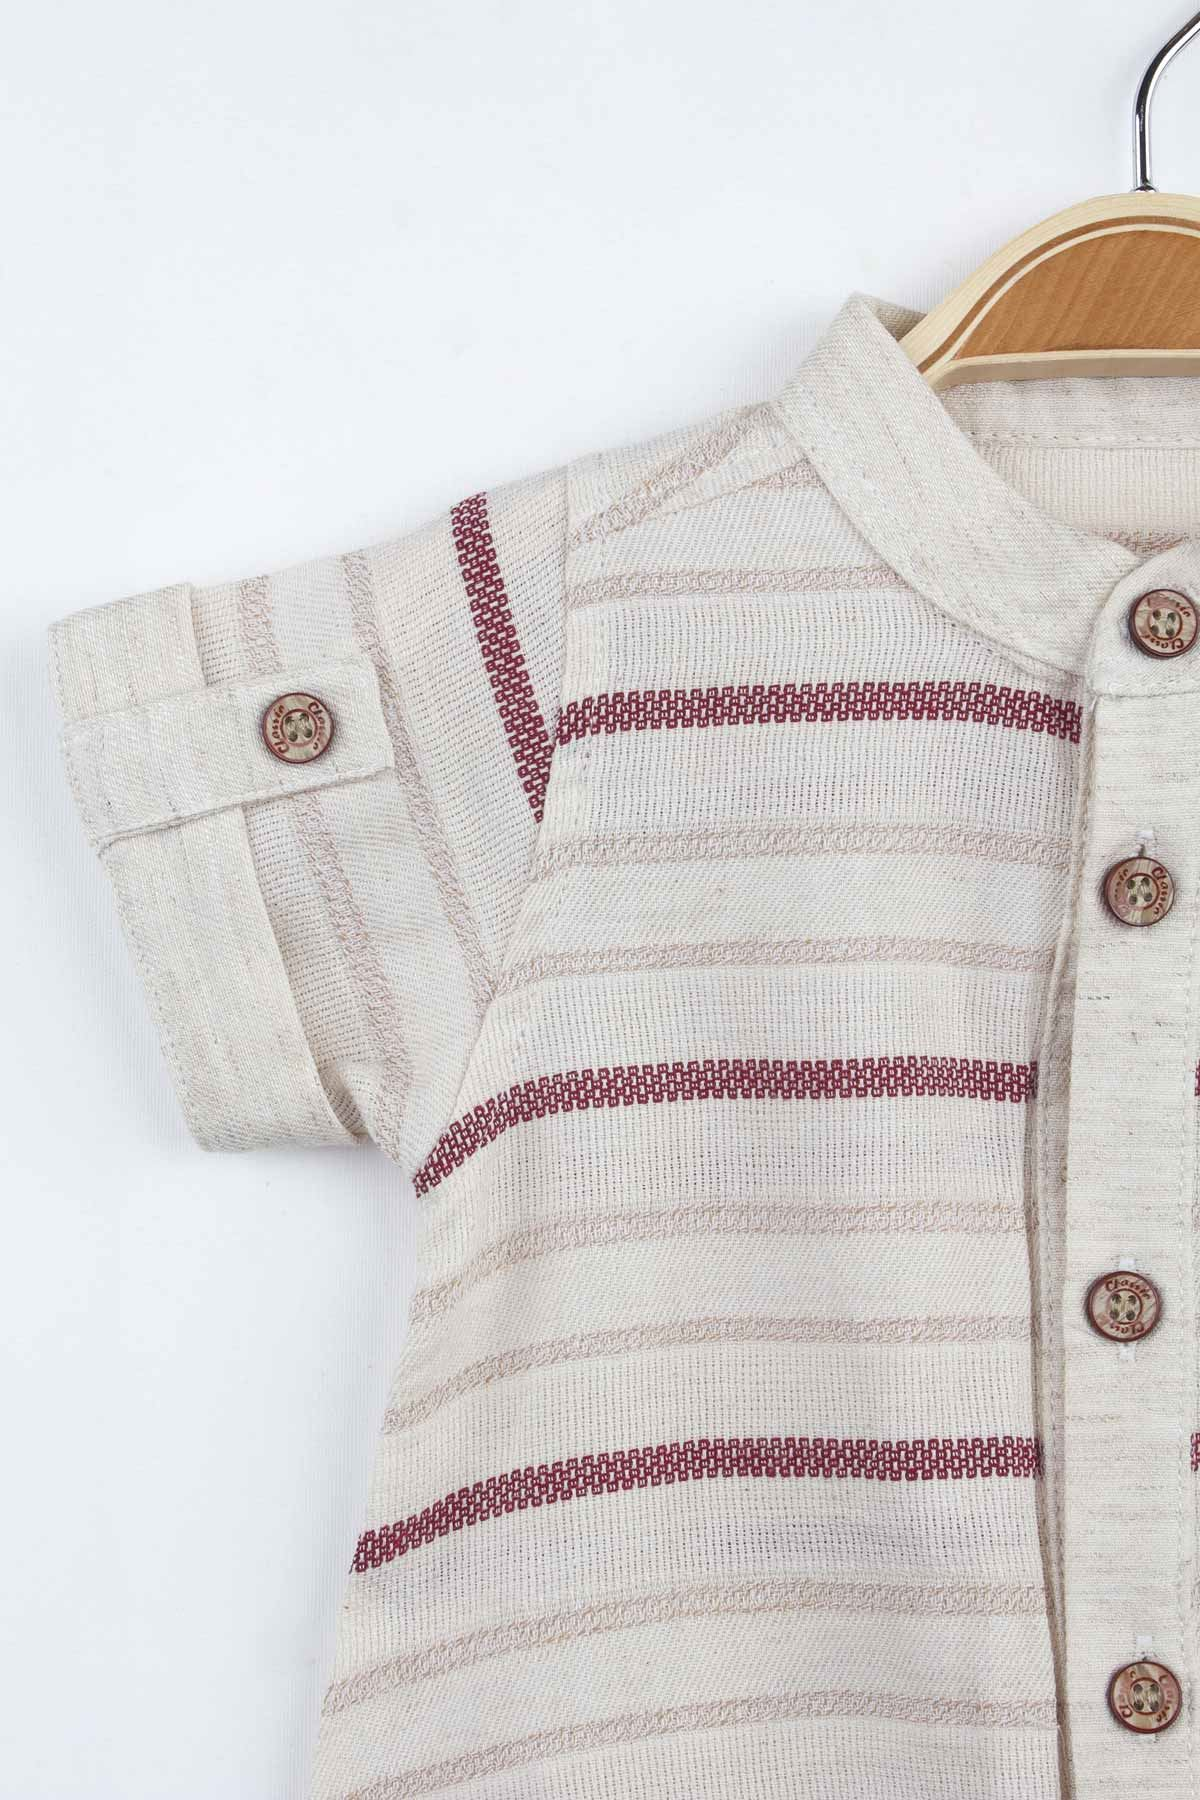 Burgundy Summer Baby Boy Shirt Model Body Underwear Clothing babies Male Boys Cotton Comfortable Models